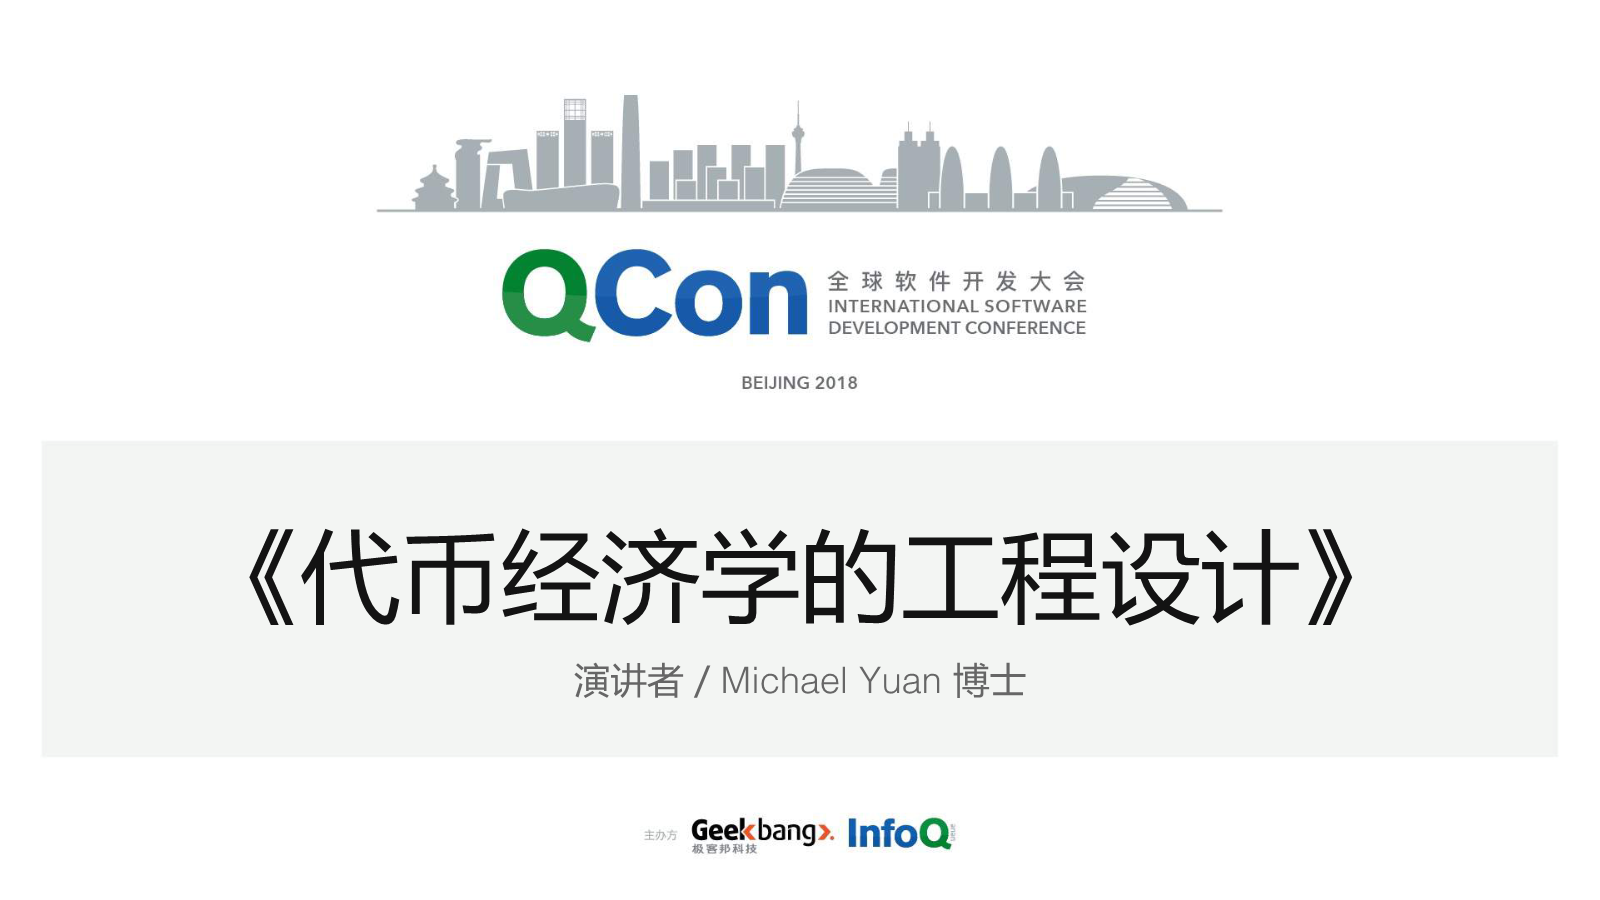 Michael Yuan-如何解决区块链的技术挑战